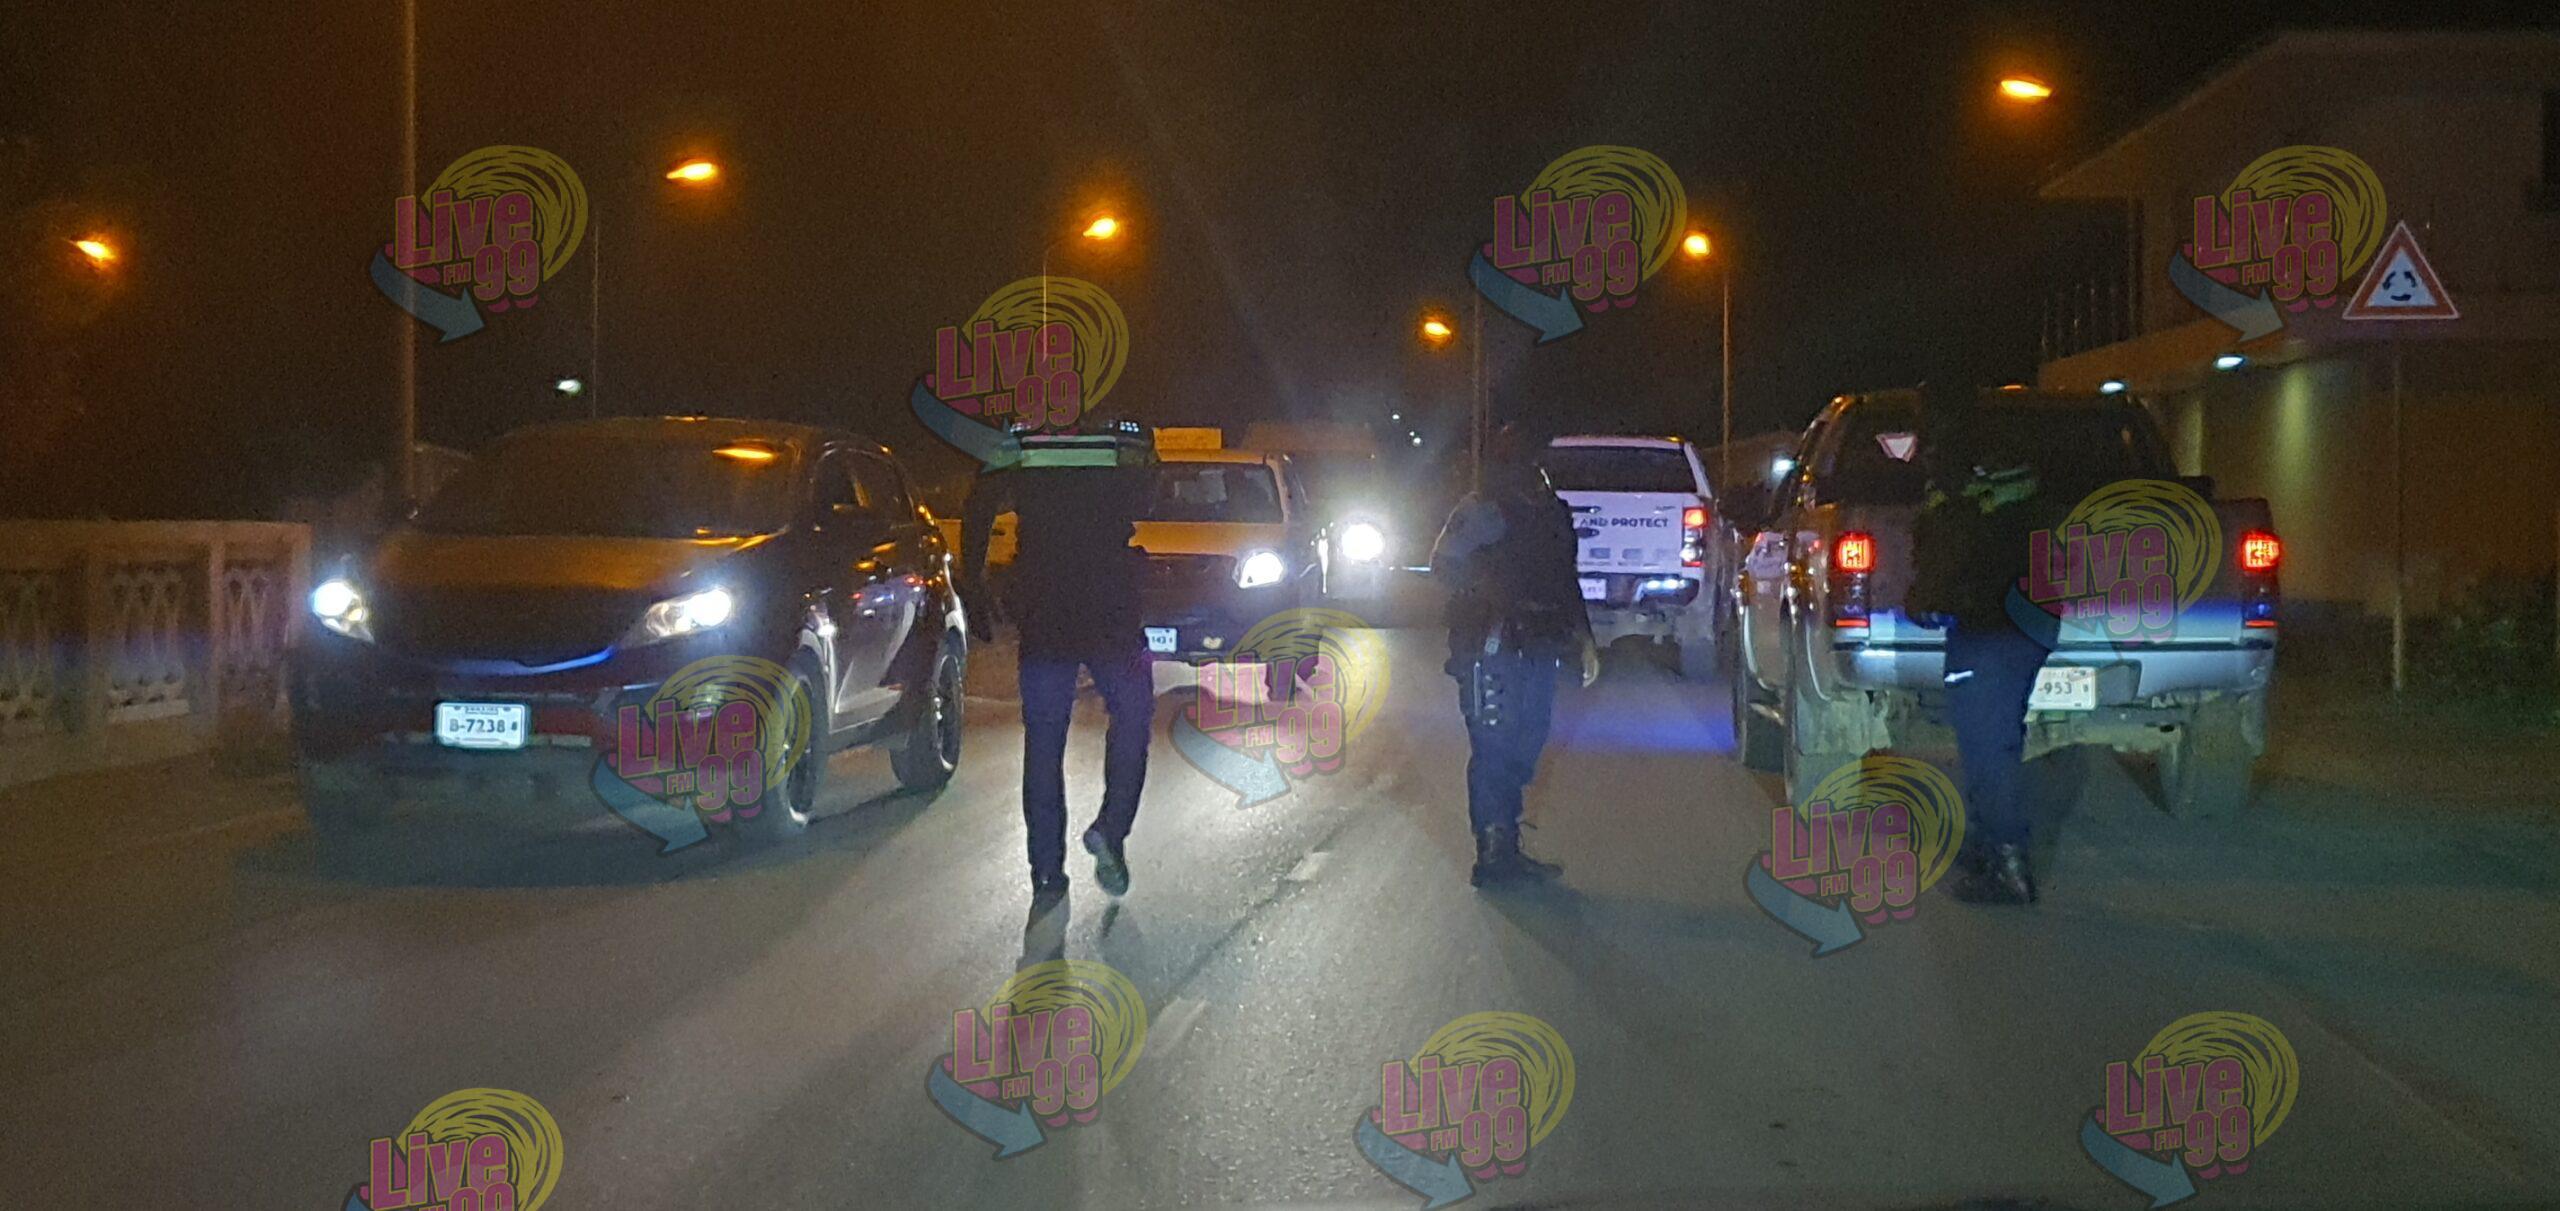 POLIS A PARTI 23 BUT DURANTE PROMÉ ANOCHI DI 'TOQUE DE QUEDA'